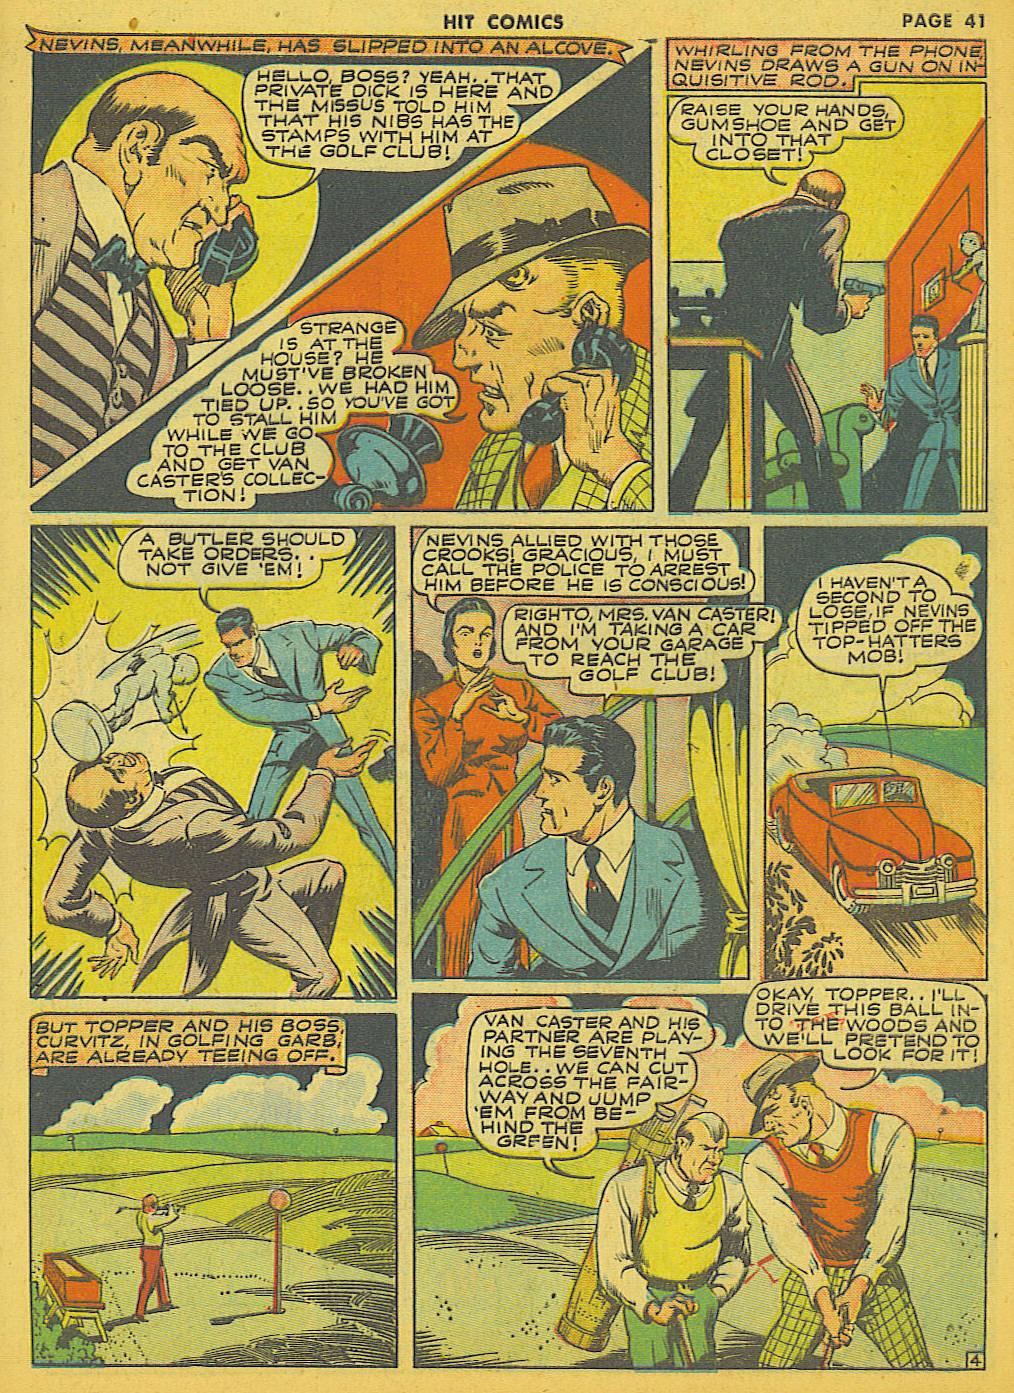 Read online Hit Comics comic -  Issue #21 - 43